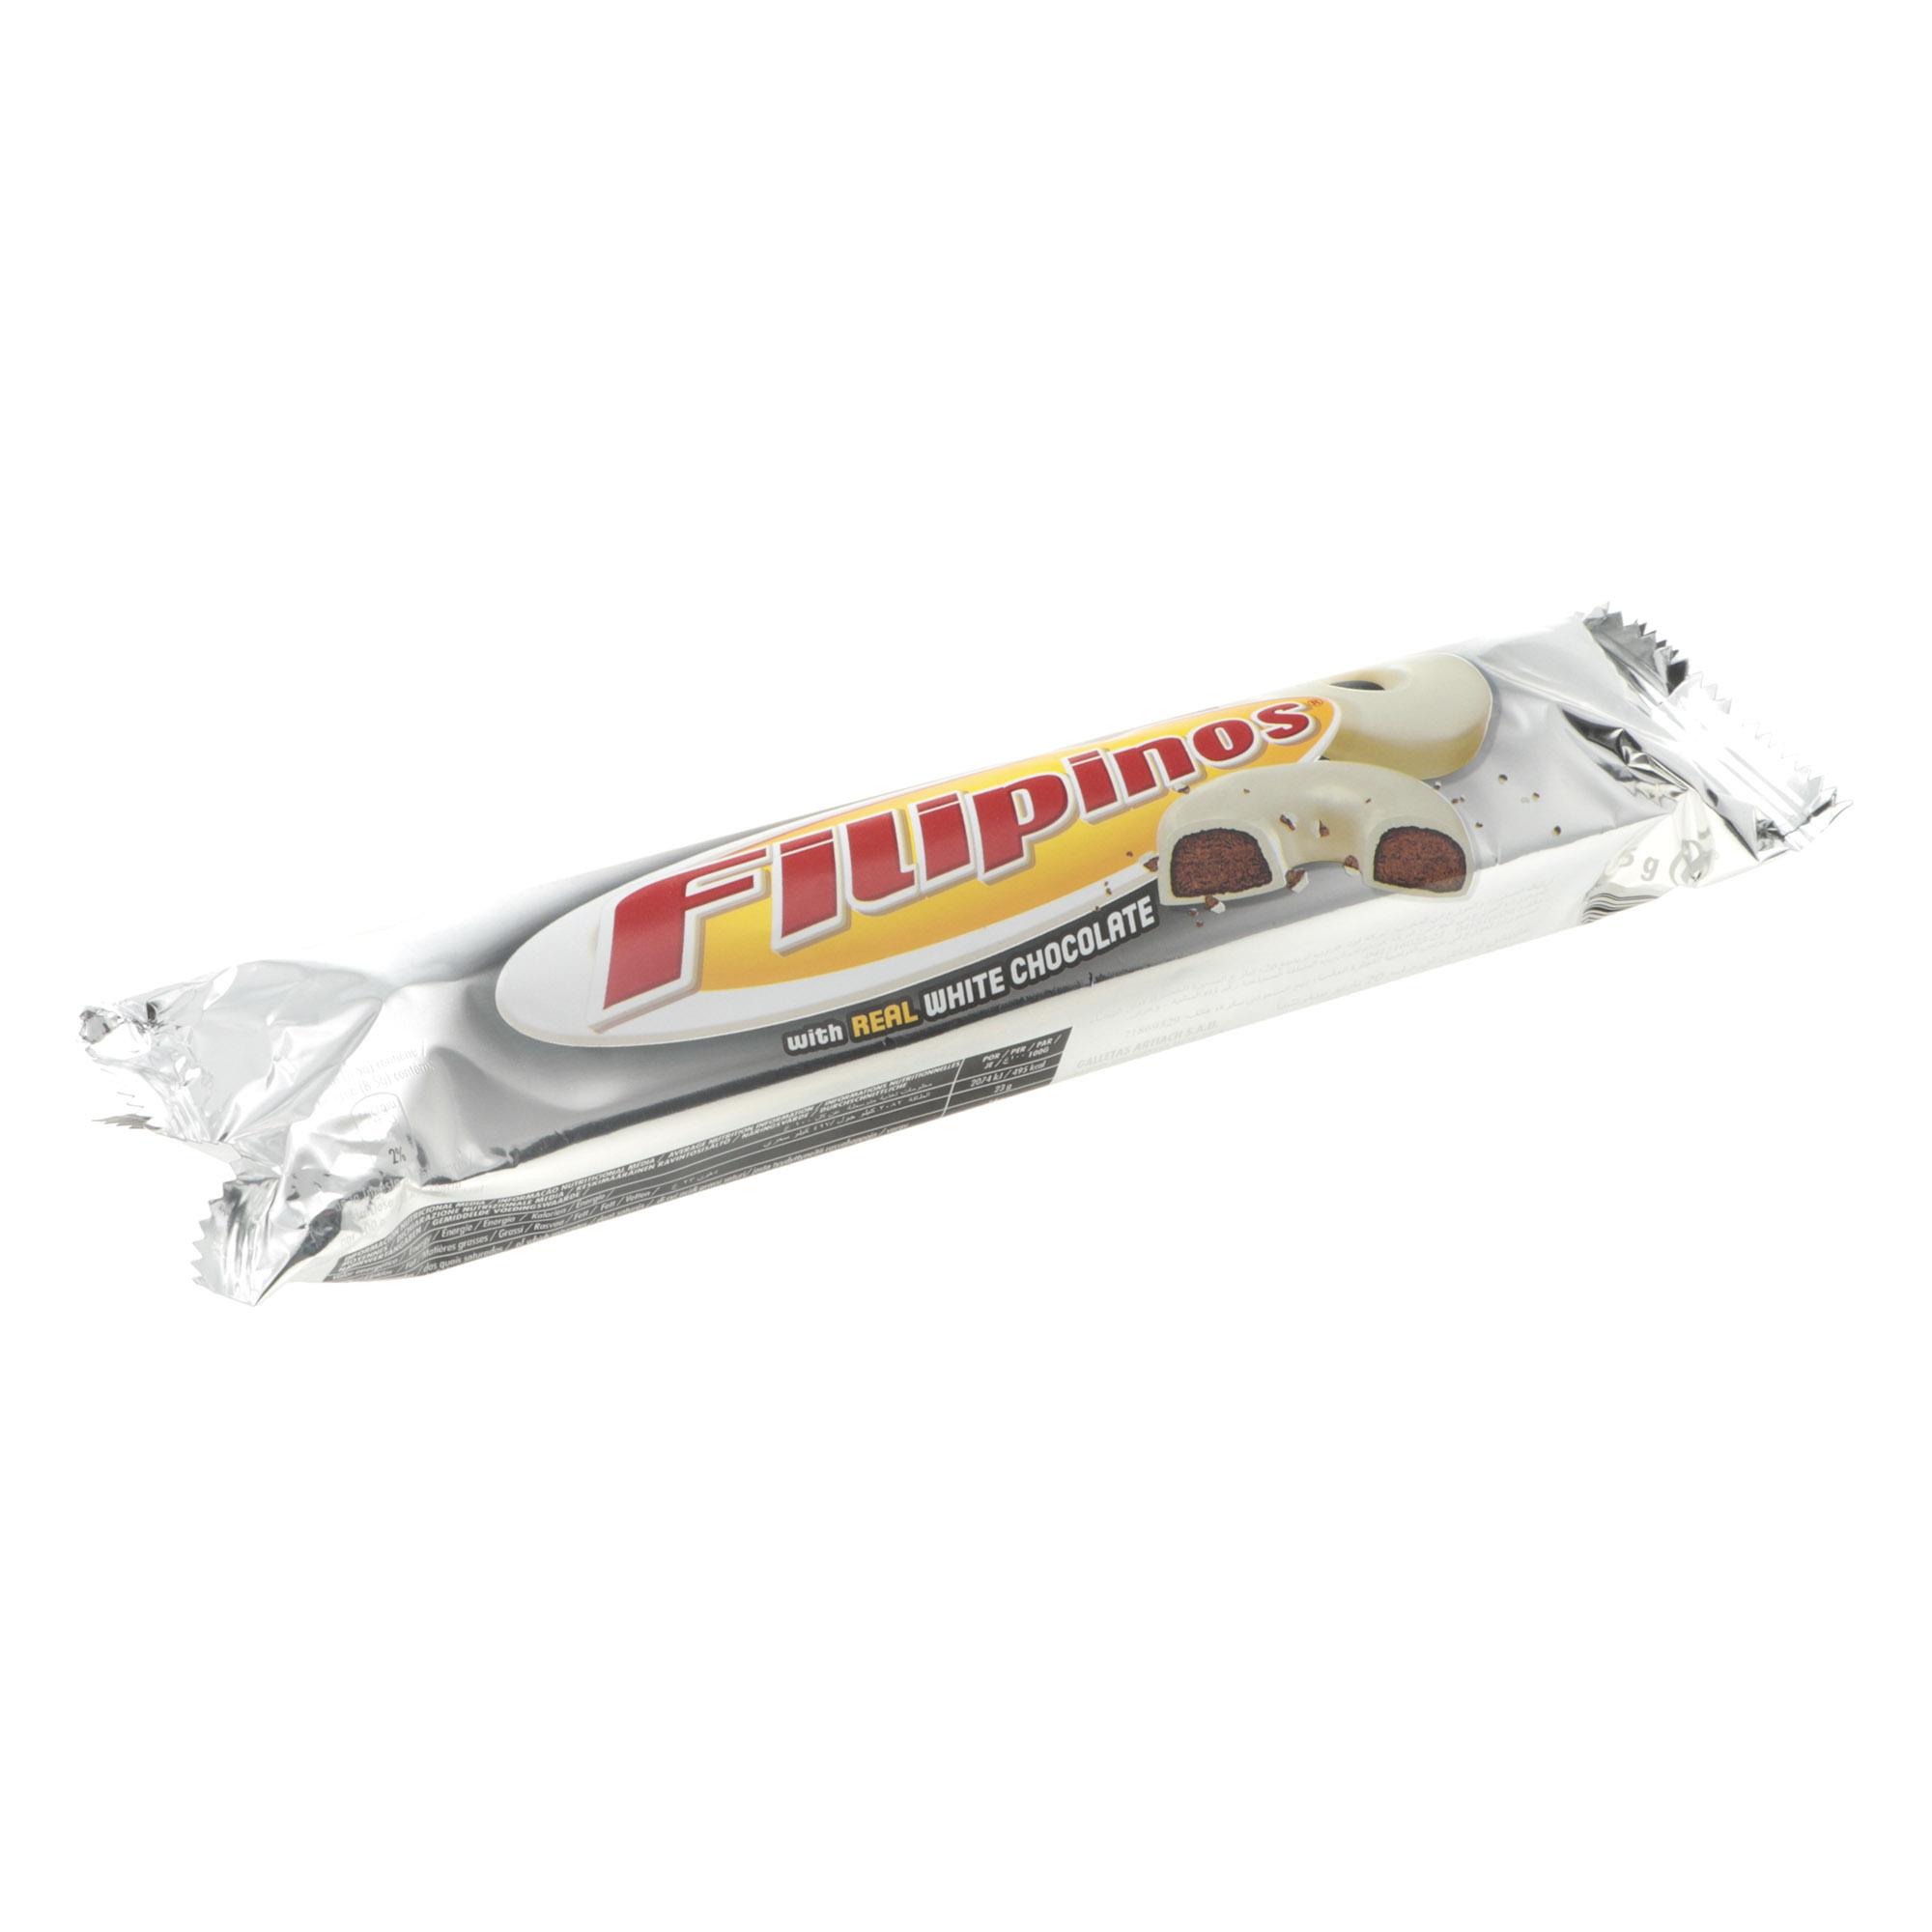 Печенье Filipinos с белым шоколадом, 135 г бальзен печенье сендвич pick up с белым шоколадом bahlsen